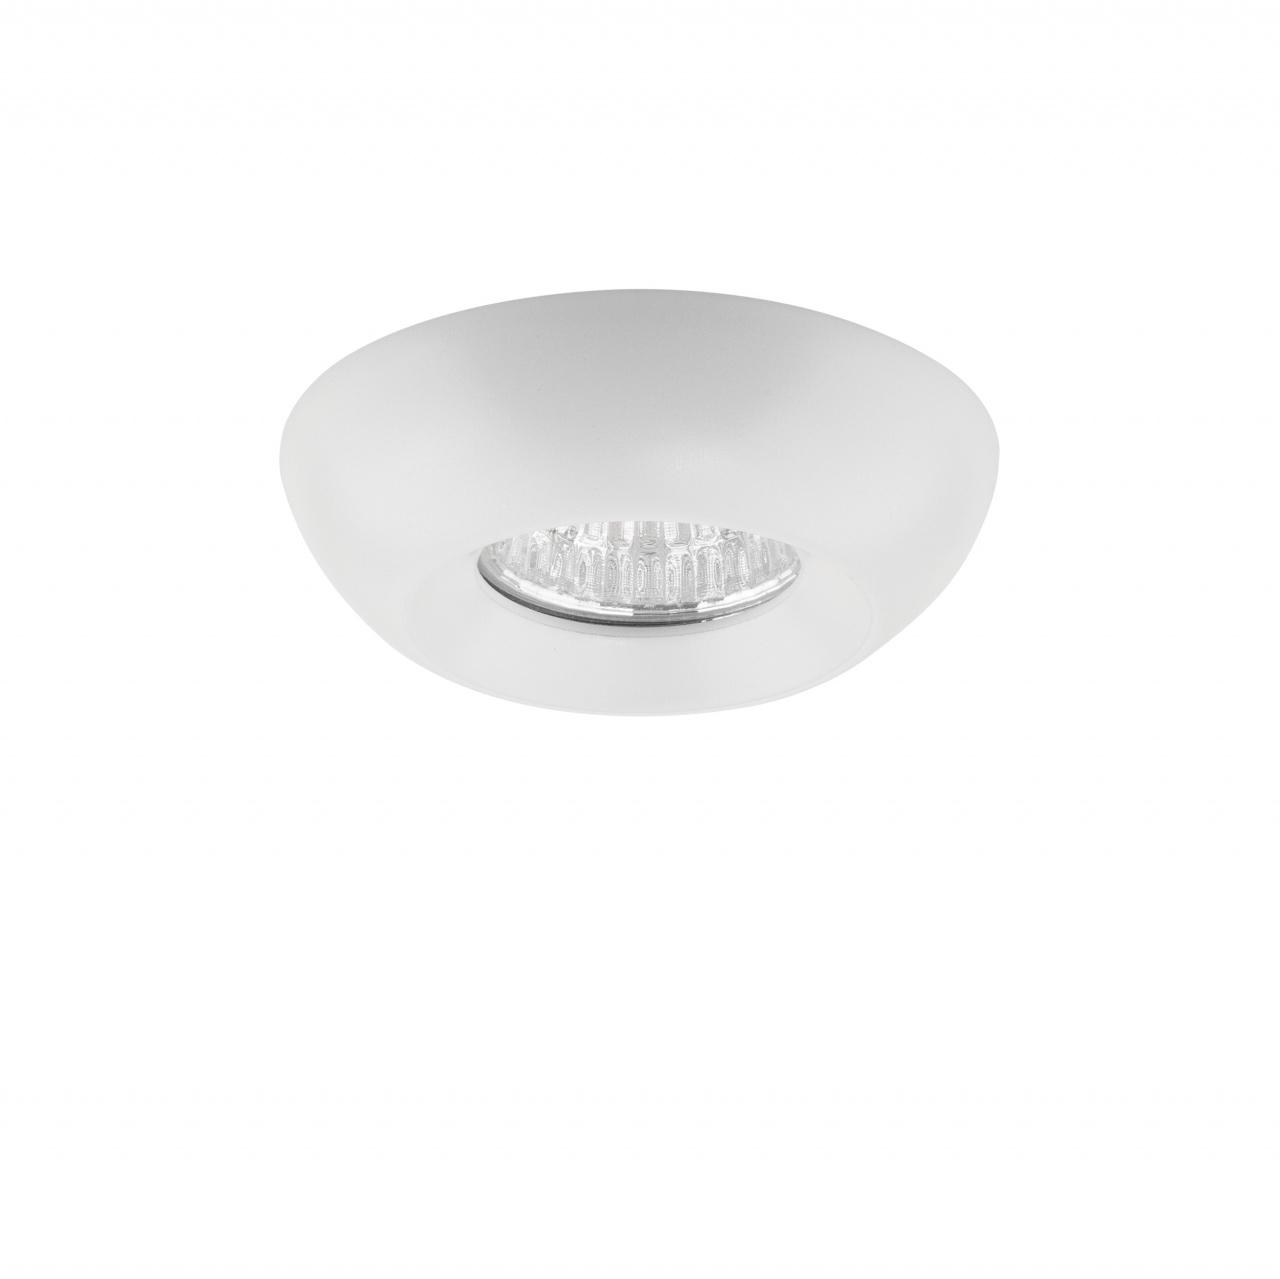 Светильник Monde LED 3W 240LM 30G белый 4000K Lightstar 071136